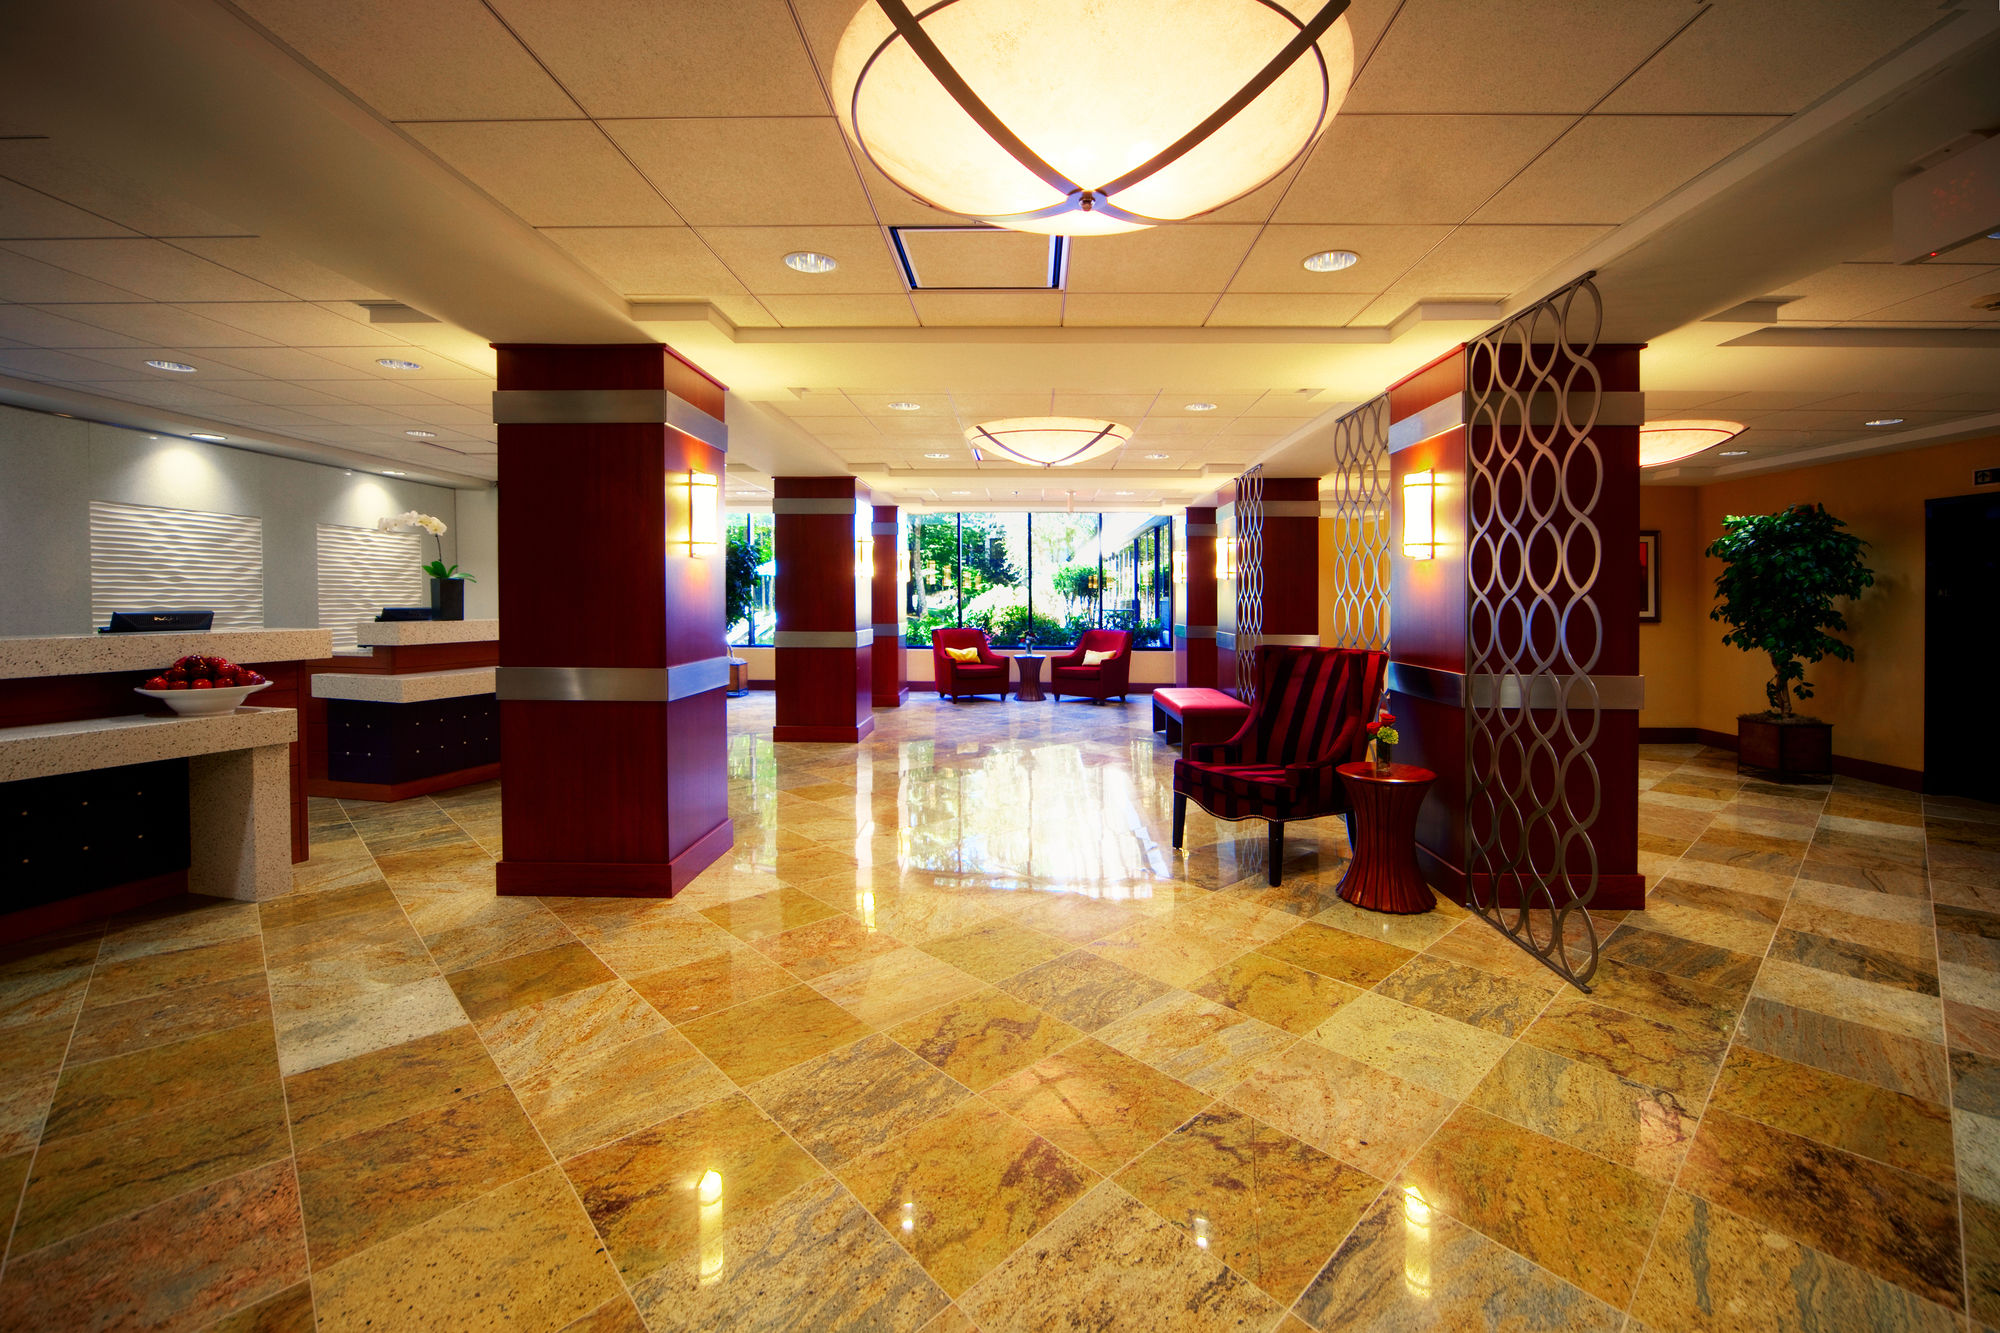 Marriott hotel coupons - Mobile hotel deals